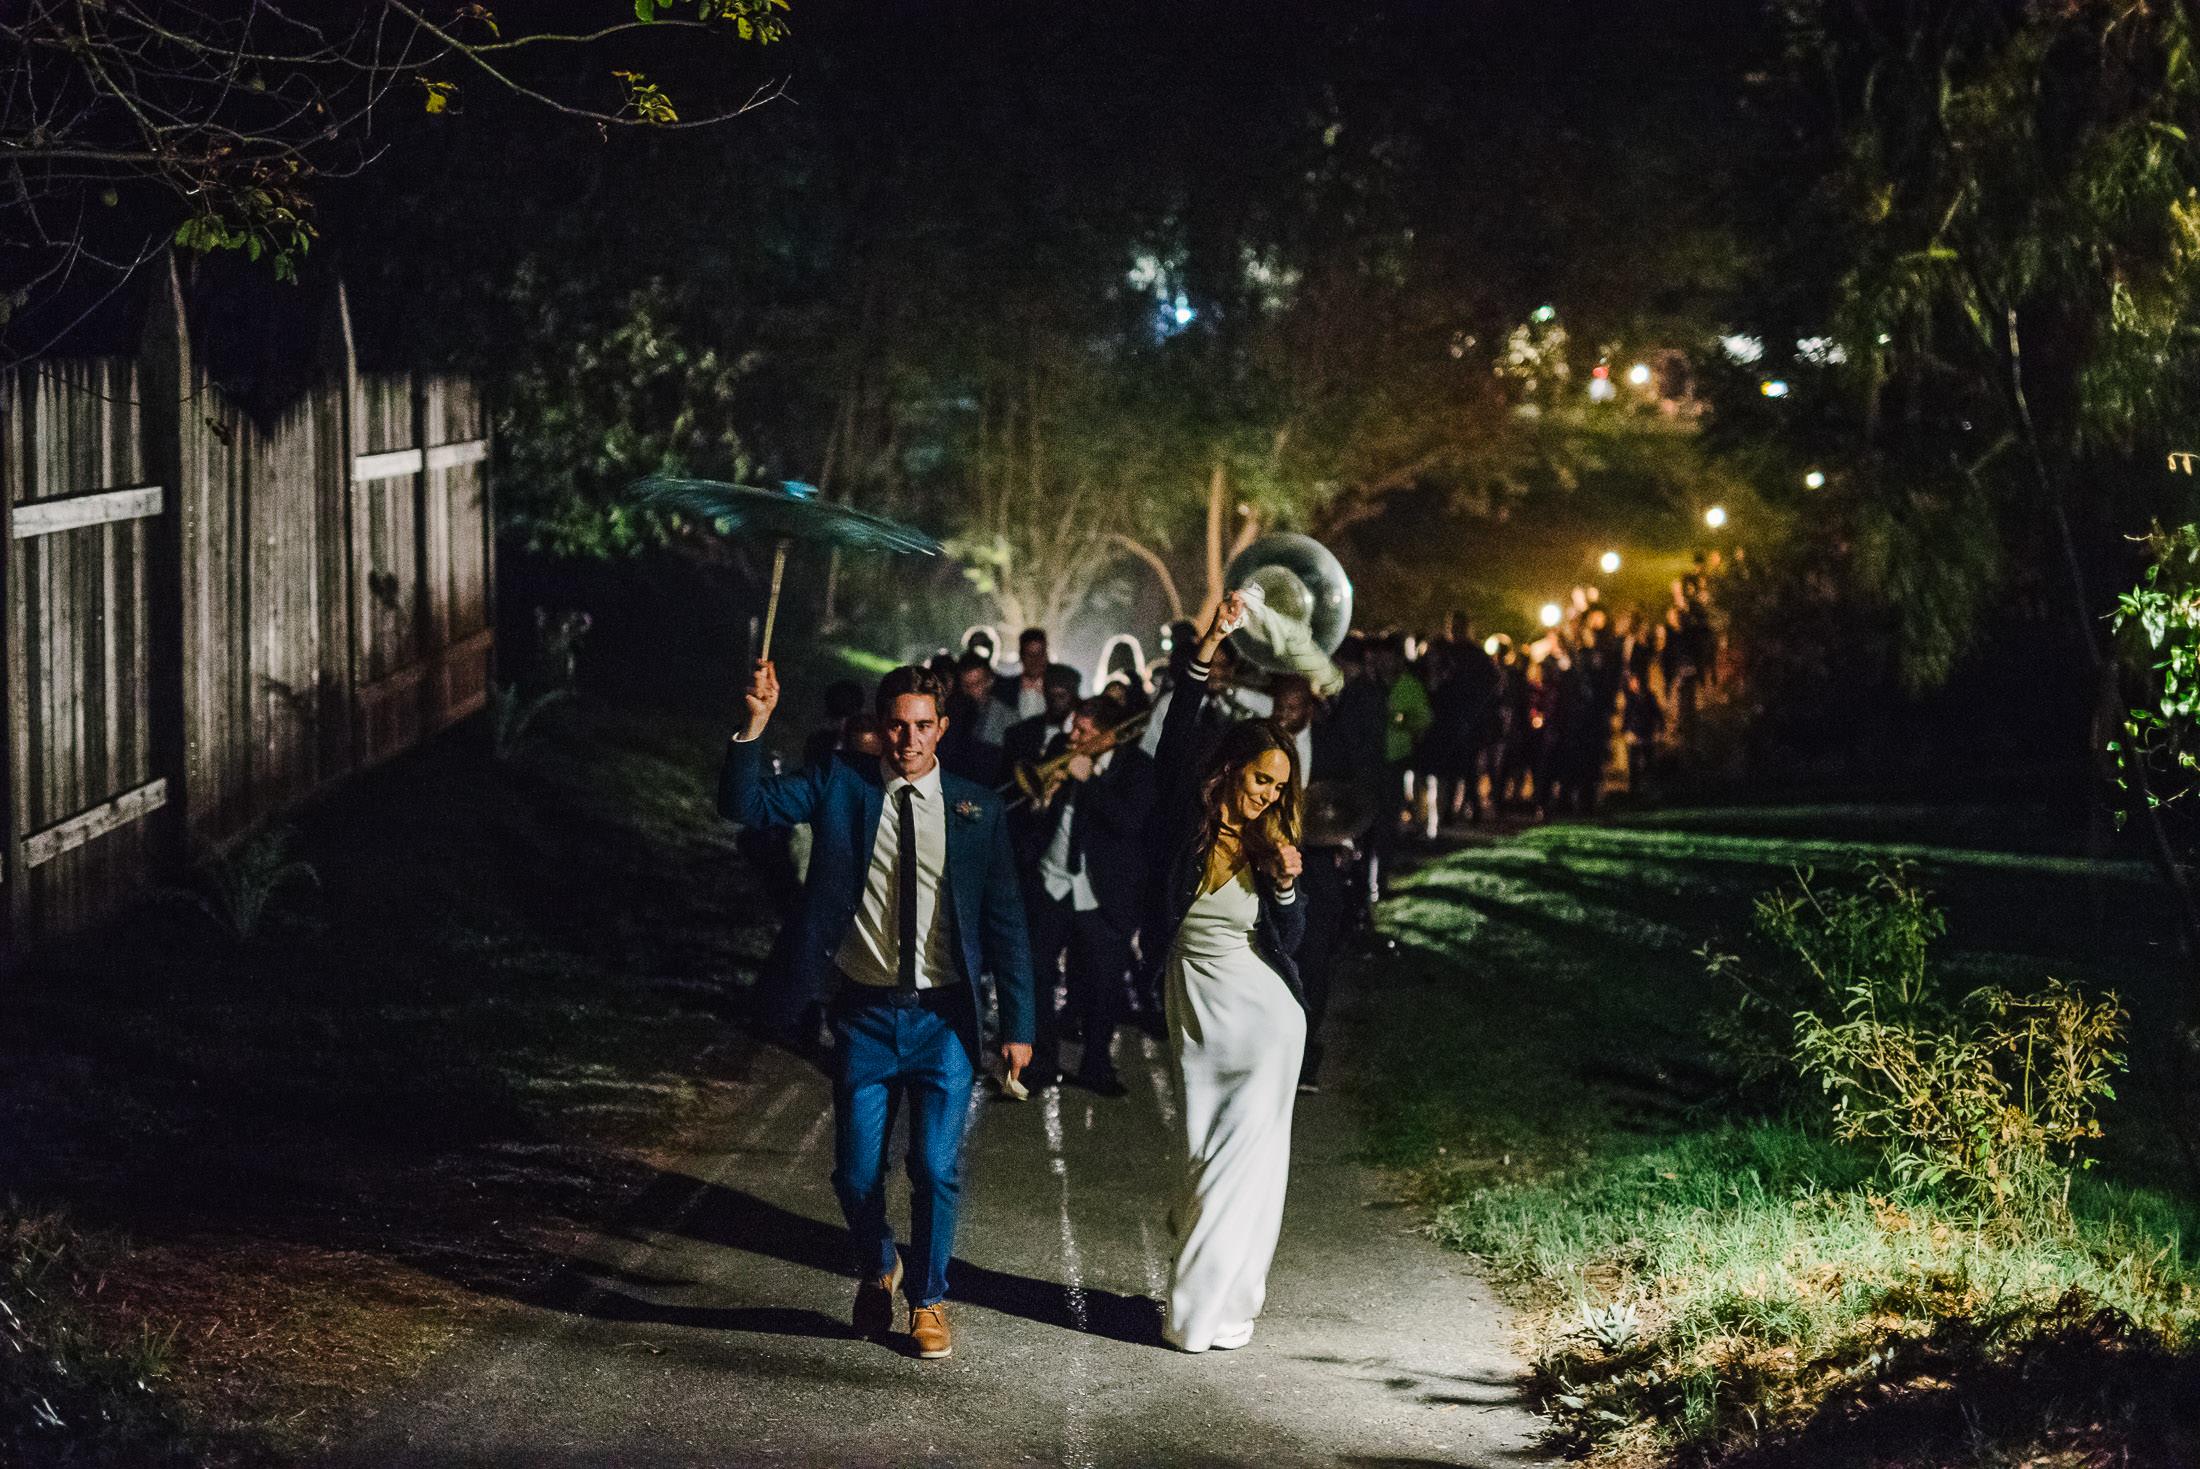 Dawn ranch wedding reception parade